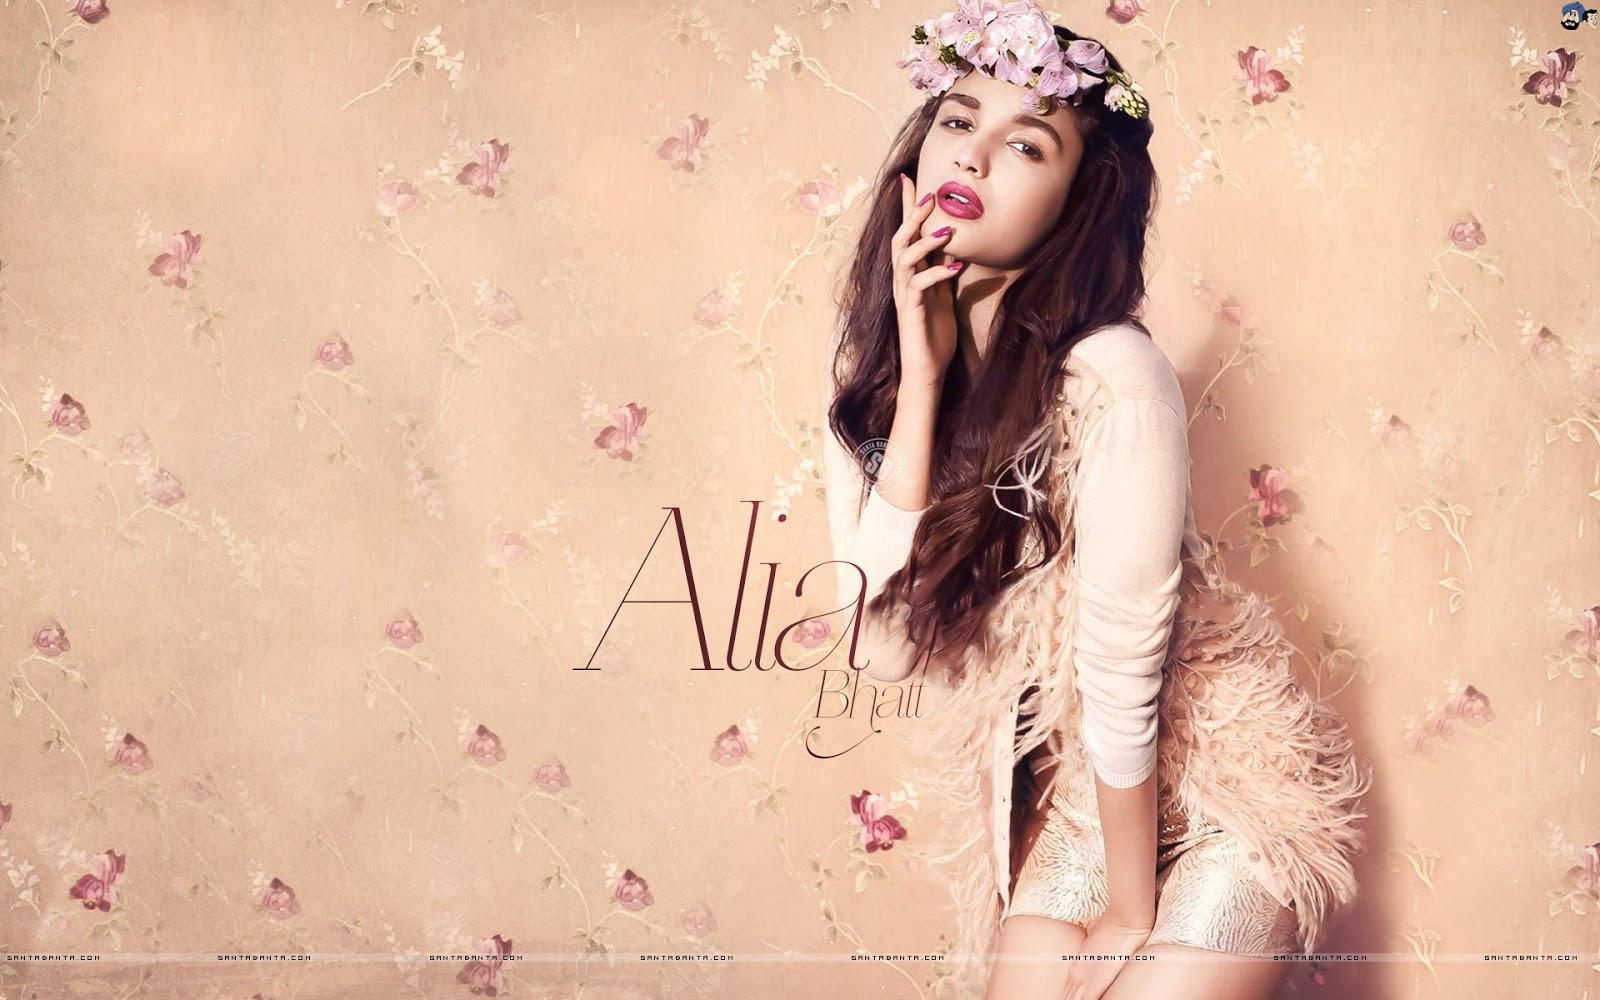 http://1.bp.blogspot.com/-tLynhB90Bvg/UO04ROt3clI/AAAAAAAAAHo/2ryTmb8GYlI/s1600/Alia+Bhatt+New+HD+Wallpapers+2013+-+Download+Actress+Alia+Bhatt+Desktop+Wallpapers.jpg